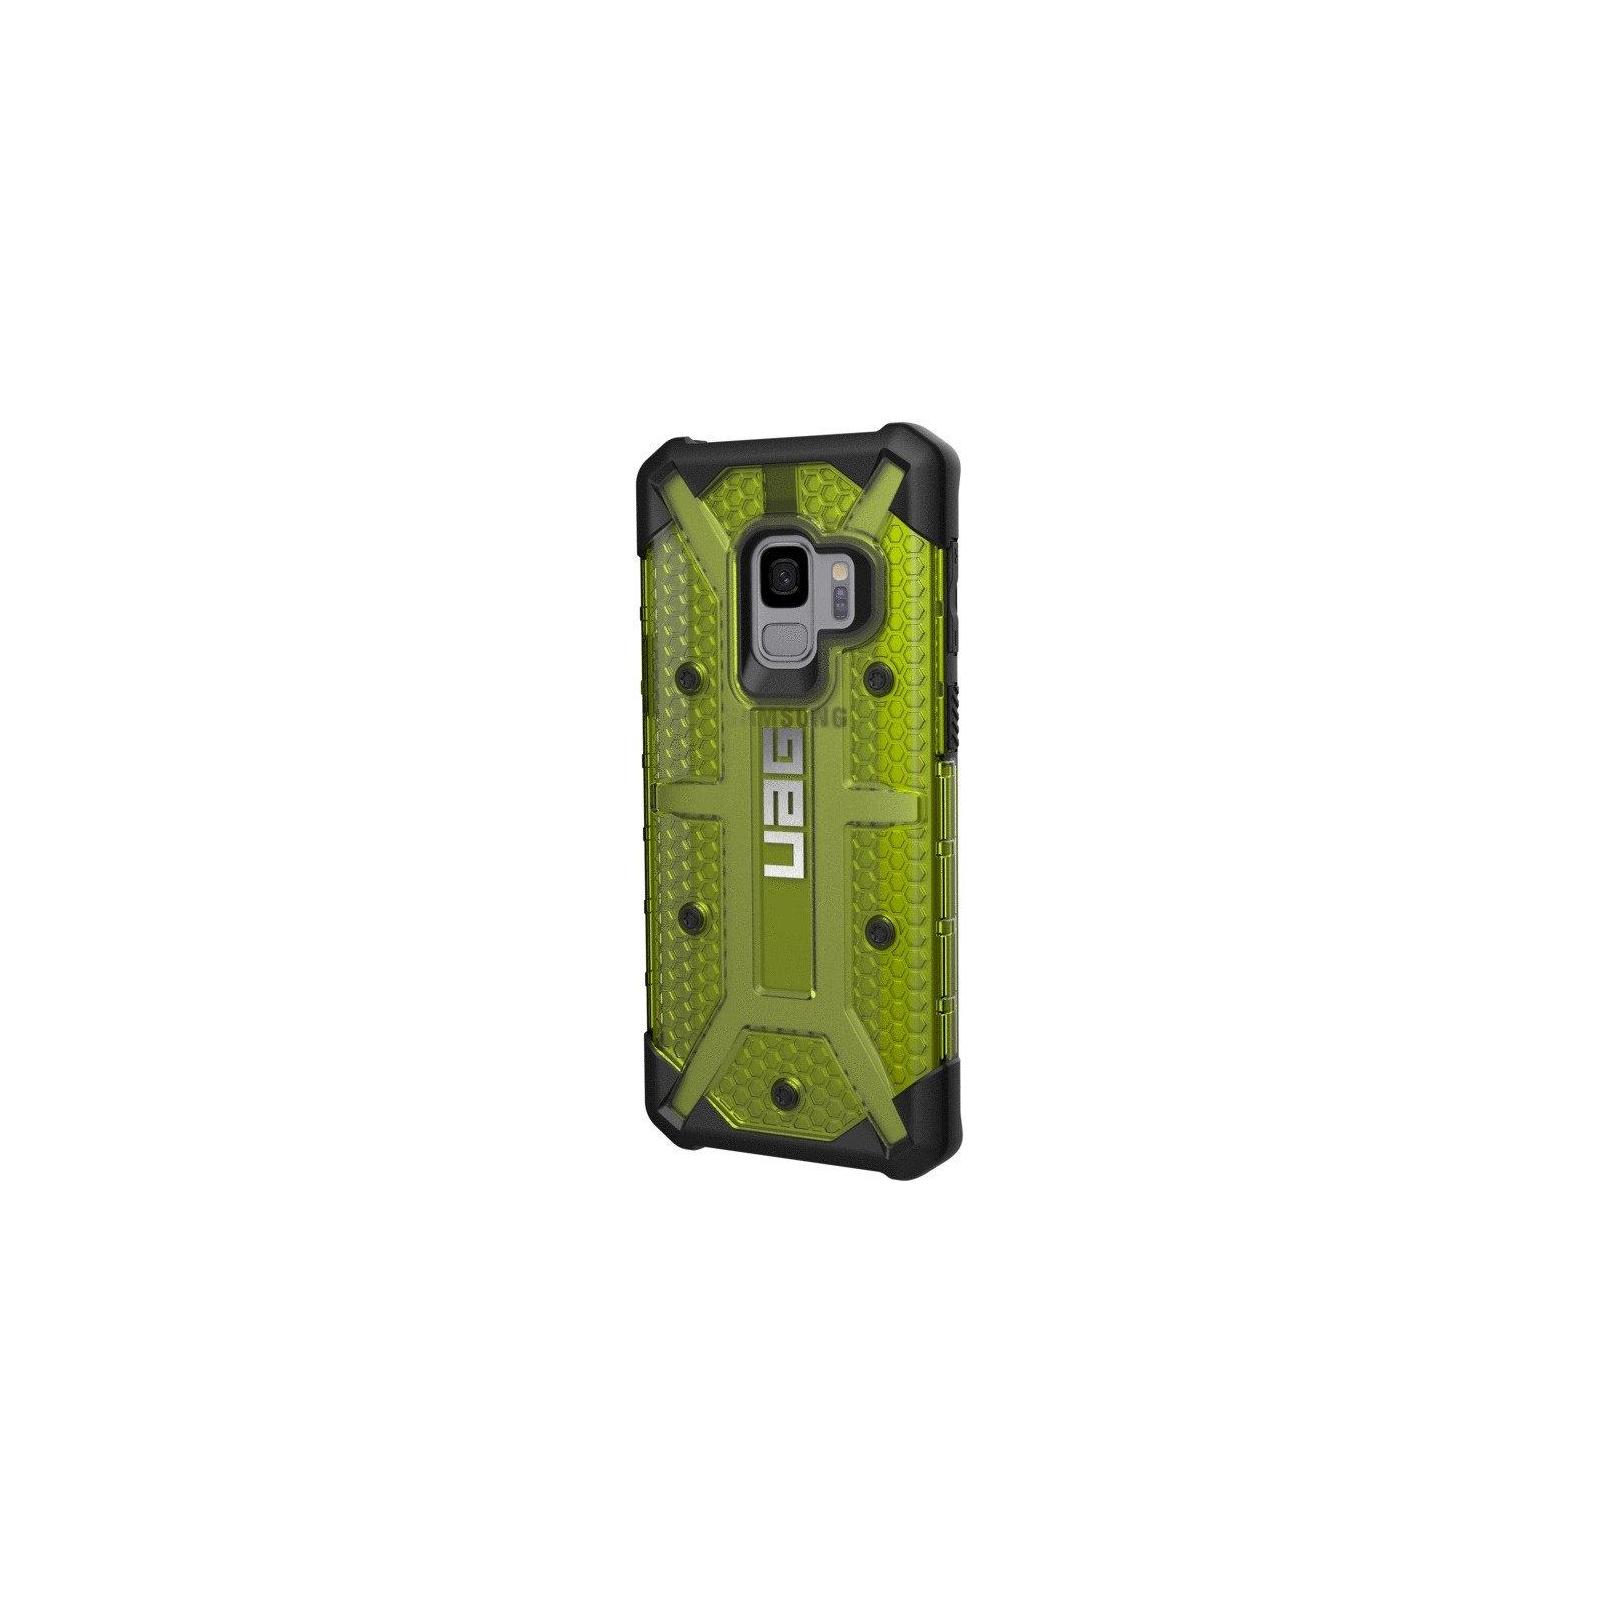 Чехол для моб. телефона Urban Armor Gear Galaxy S9 Plasma Citron (GLXS9-L-CT) изображение 4